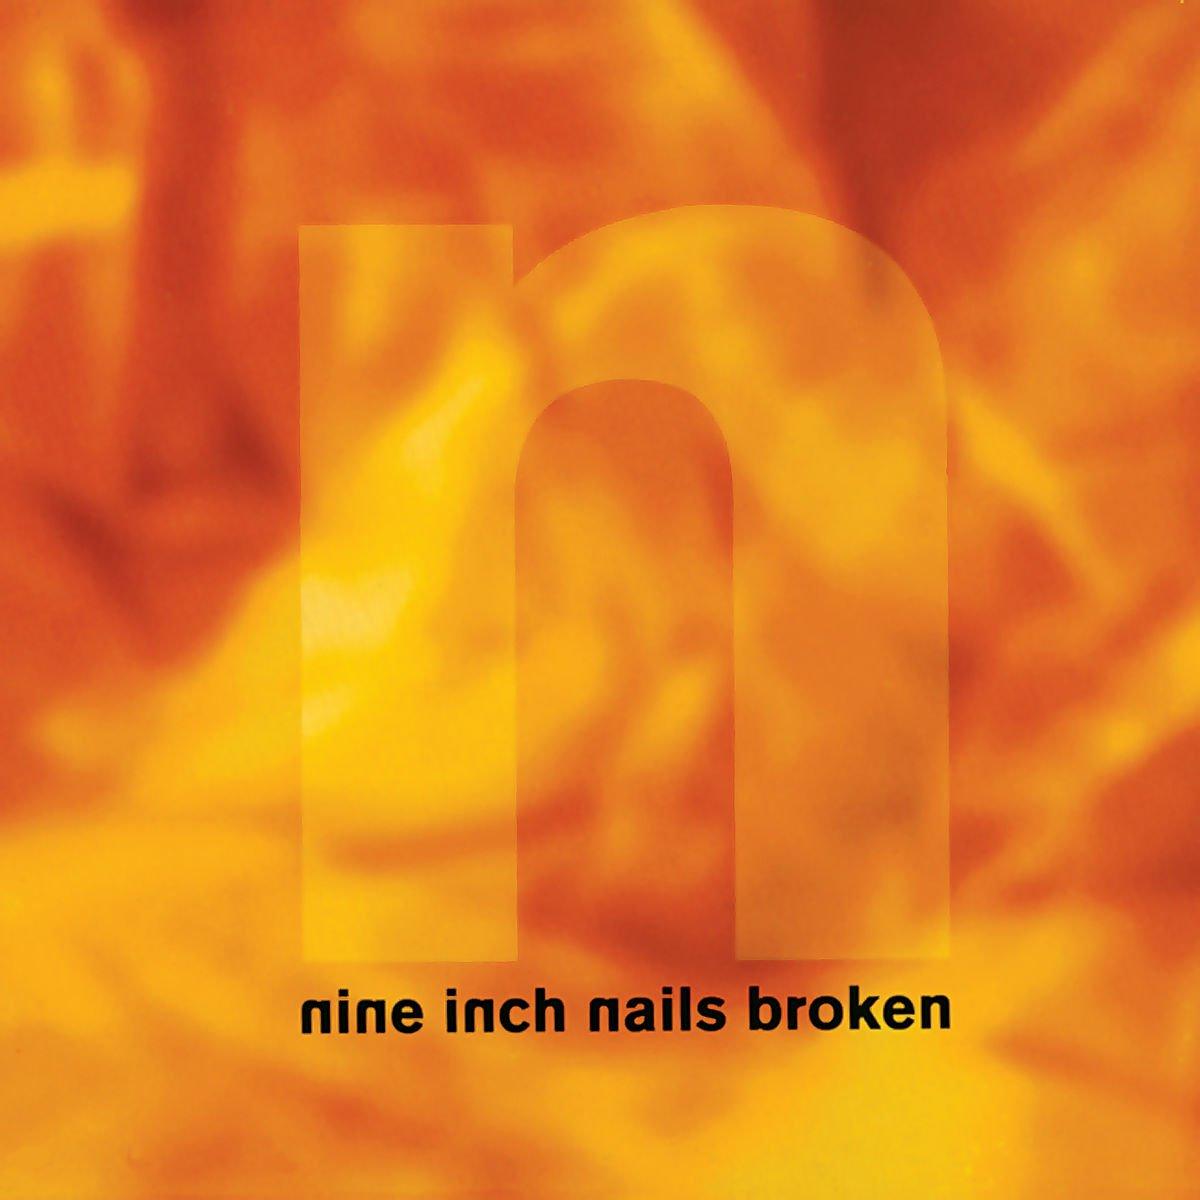 NINE INCH NAILS - Broken Ep - Amazon.com Music